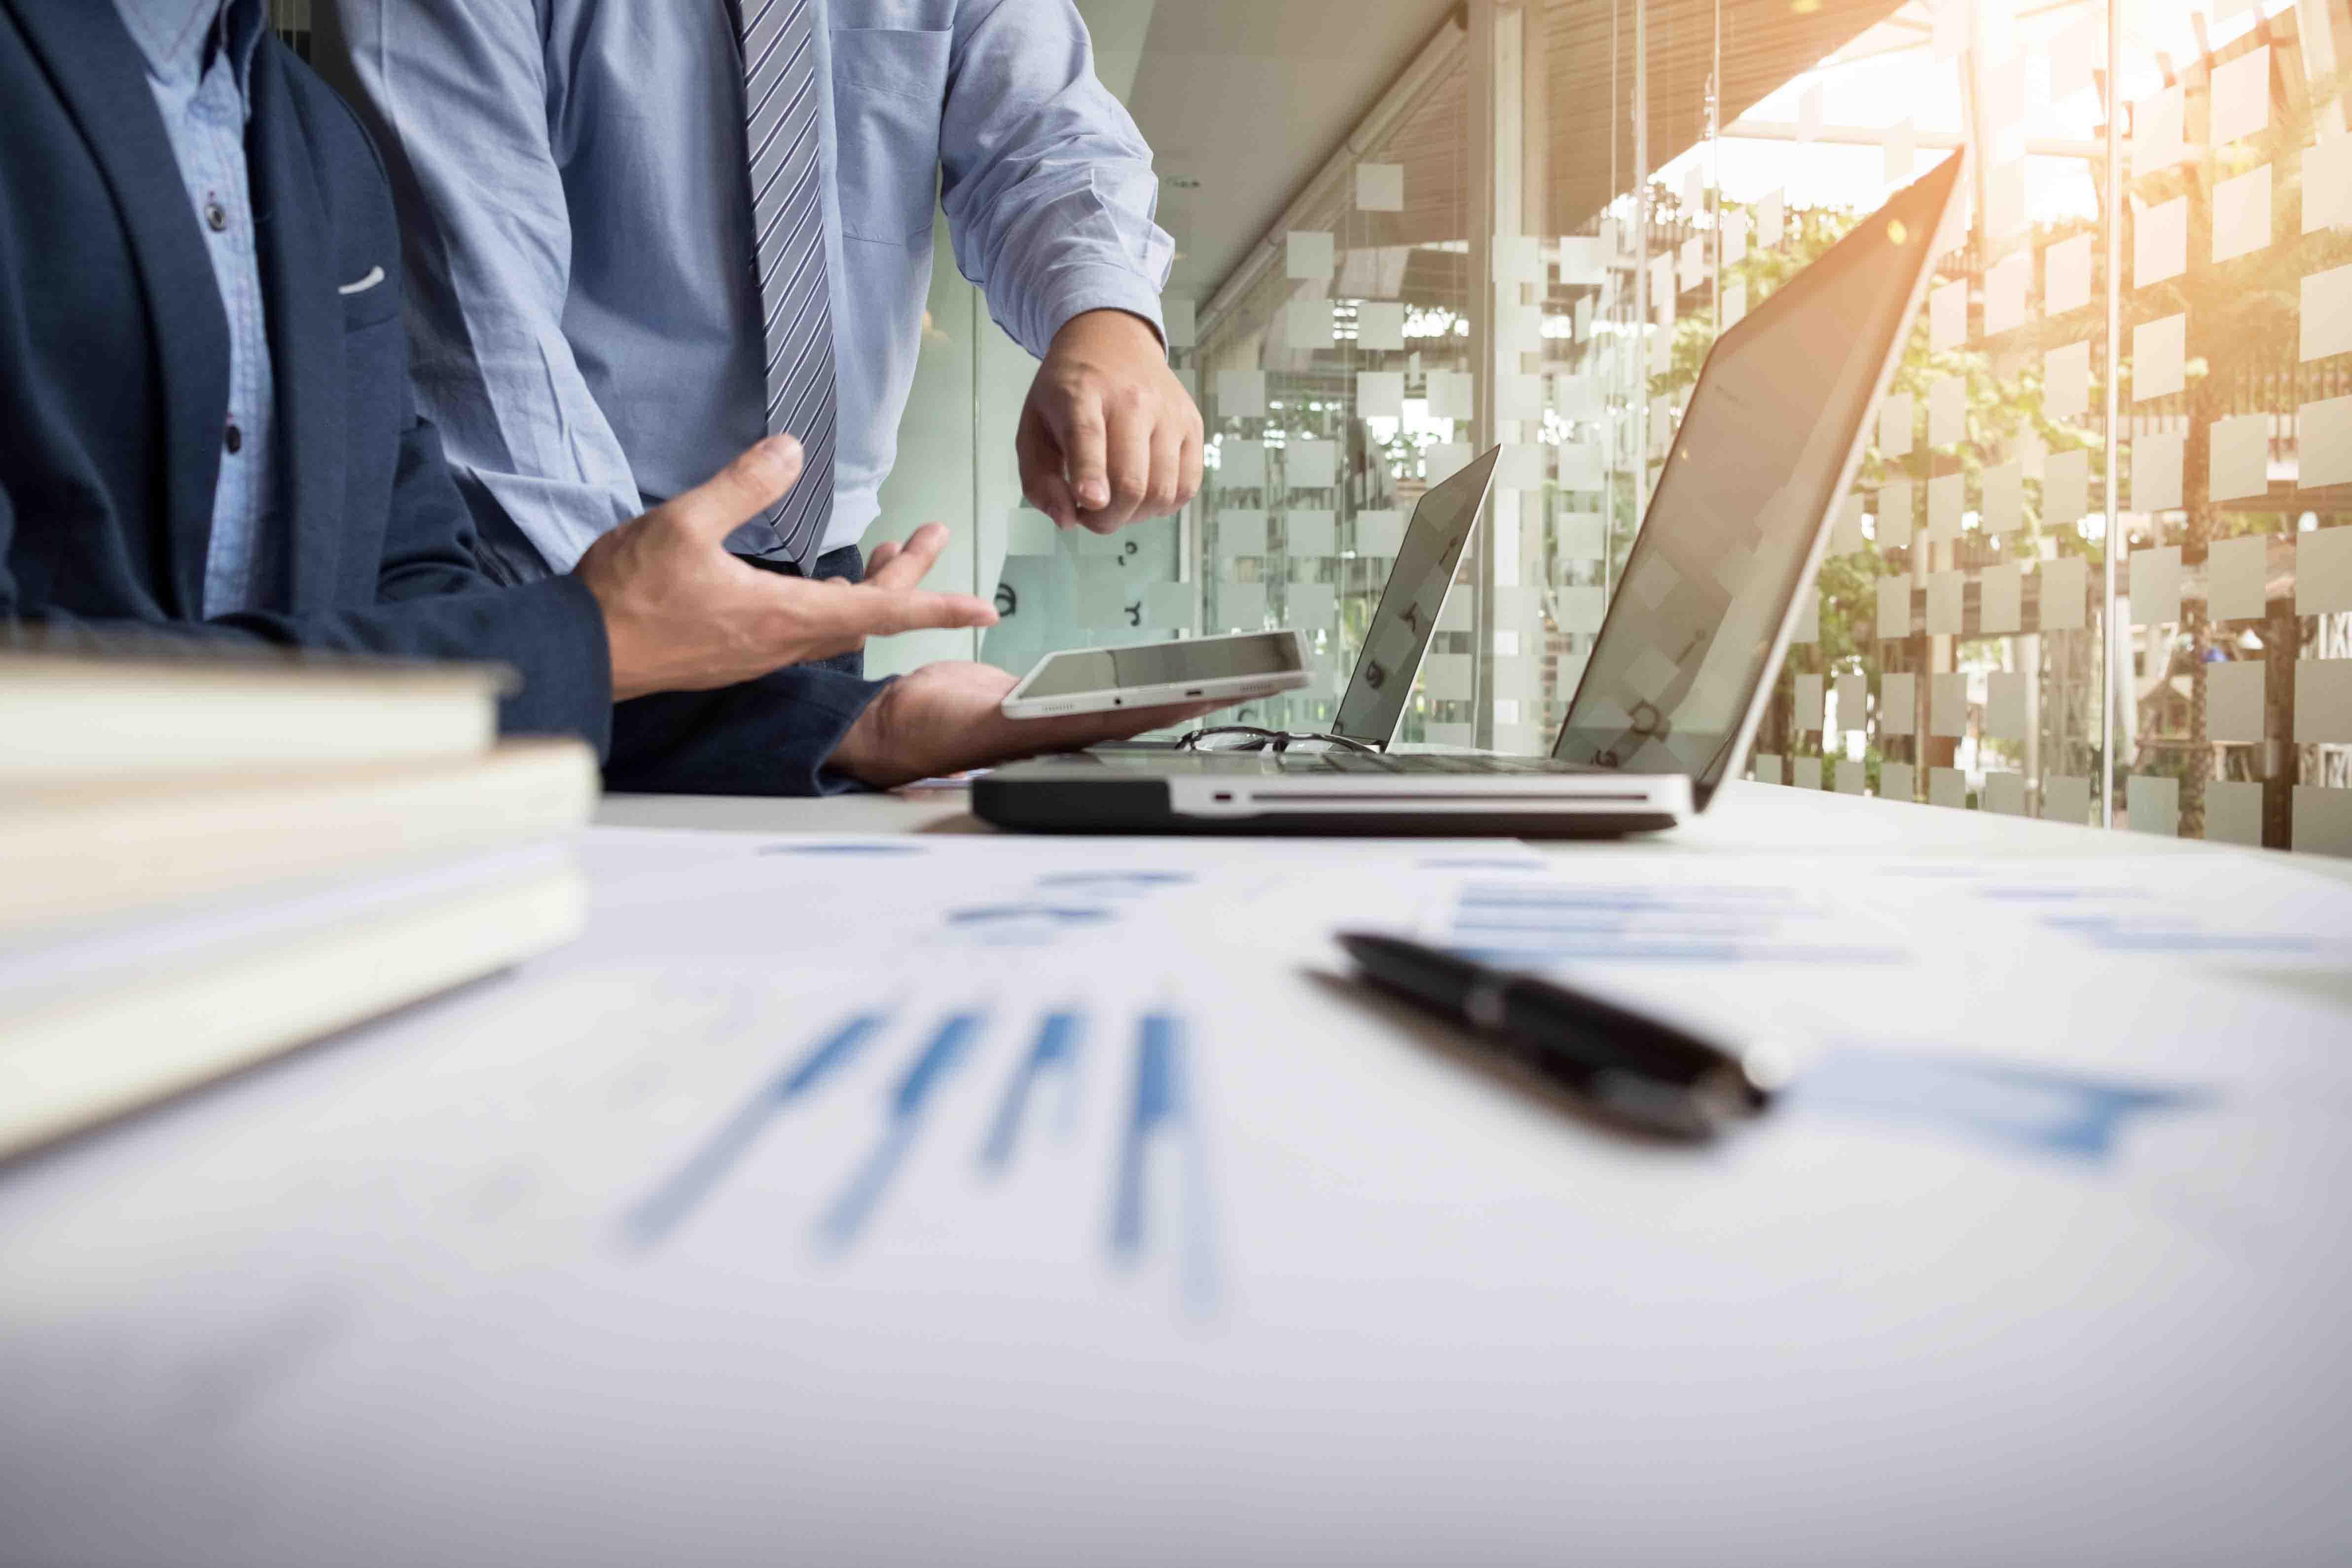 biznis analiza i konsalting agencija beograd